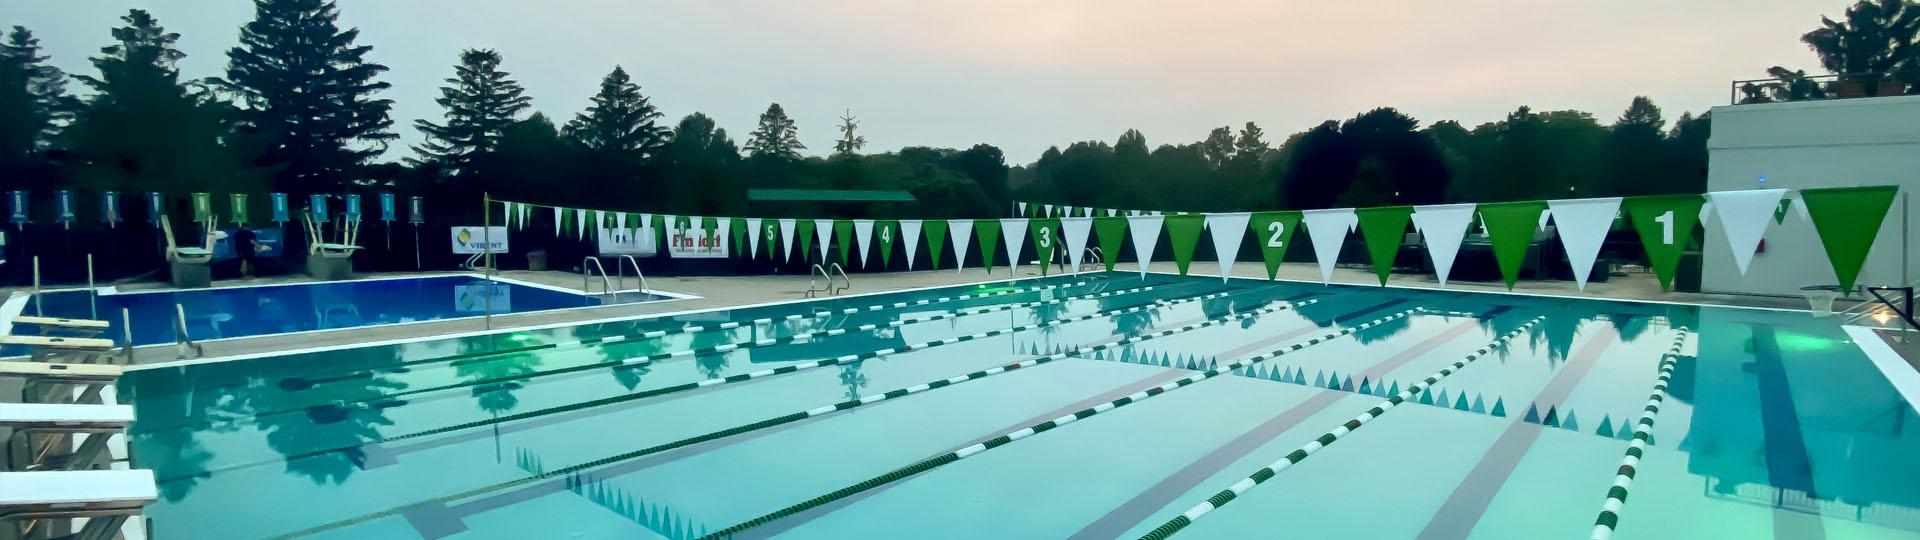 Maple Bluff Country Club Madison Wi Swim